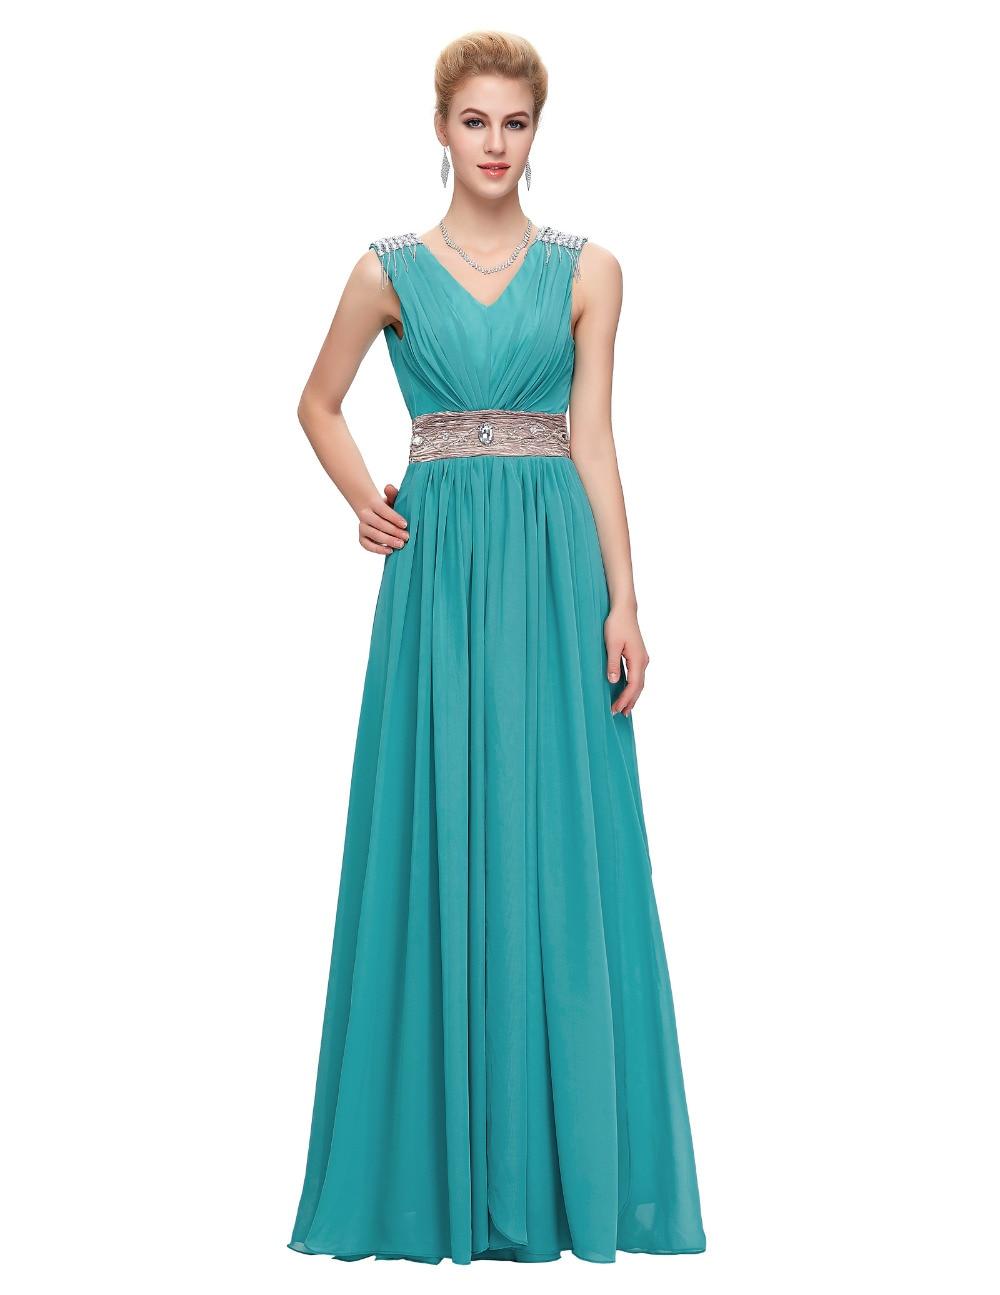 Stunning turquoise bridesmaid dresses under 50 contemporary cheap long bridesmaid dresses under 50bridesmaid dressesdressesss ombrellifo Choice Image